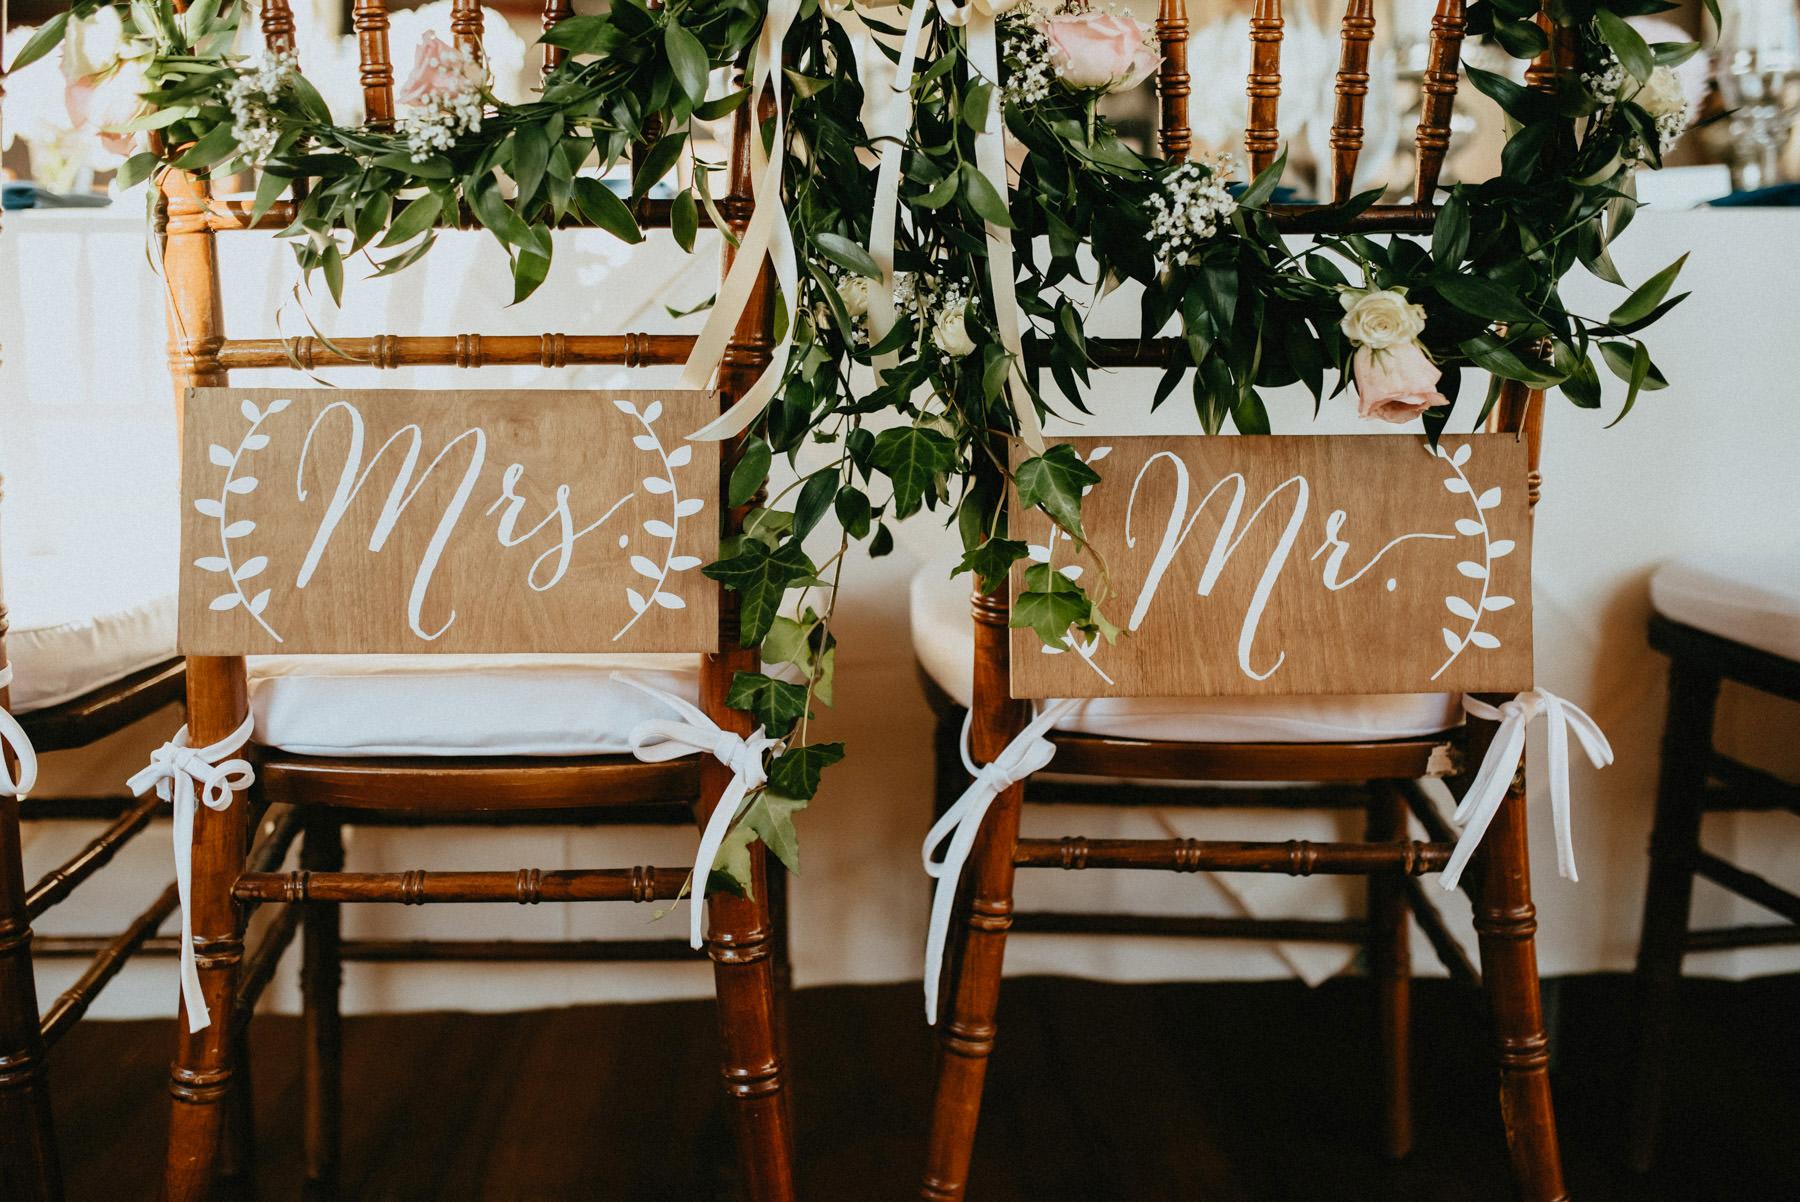 246-liberty-warehouse-brooklyn-wedding-12.jpg